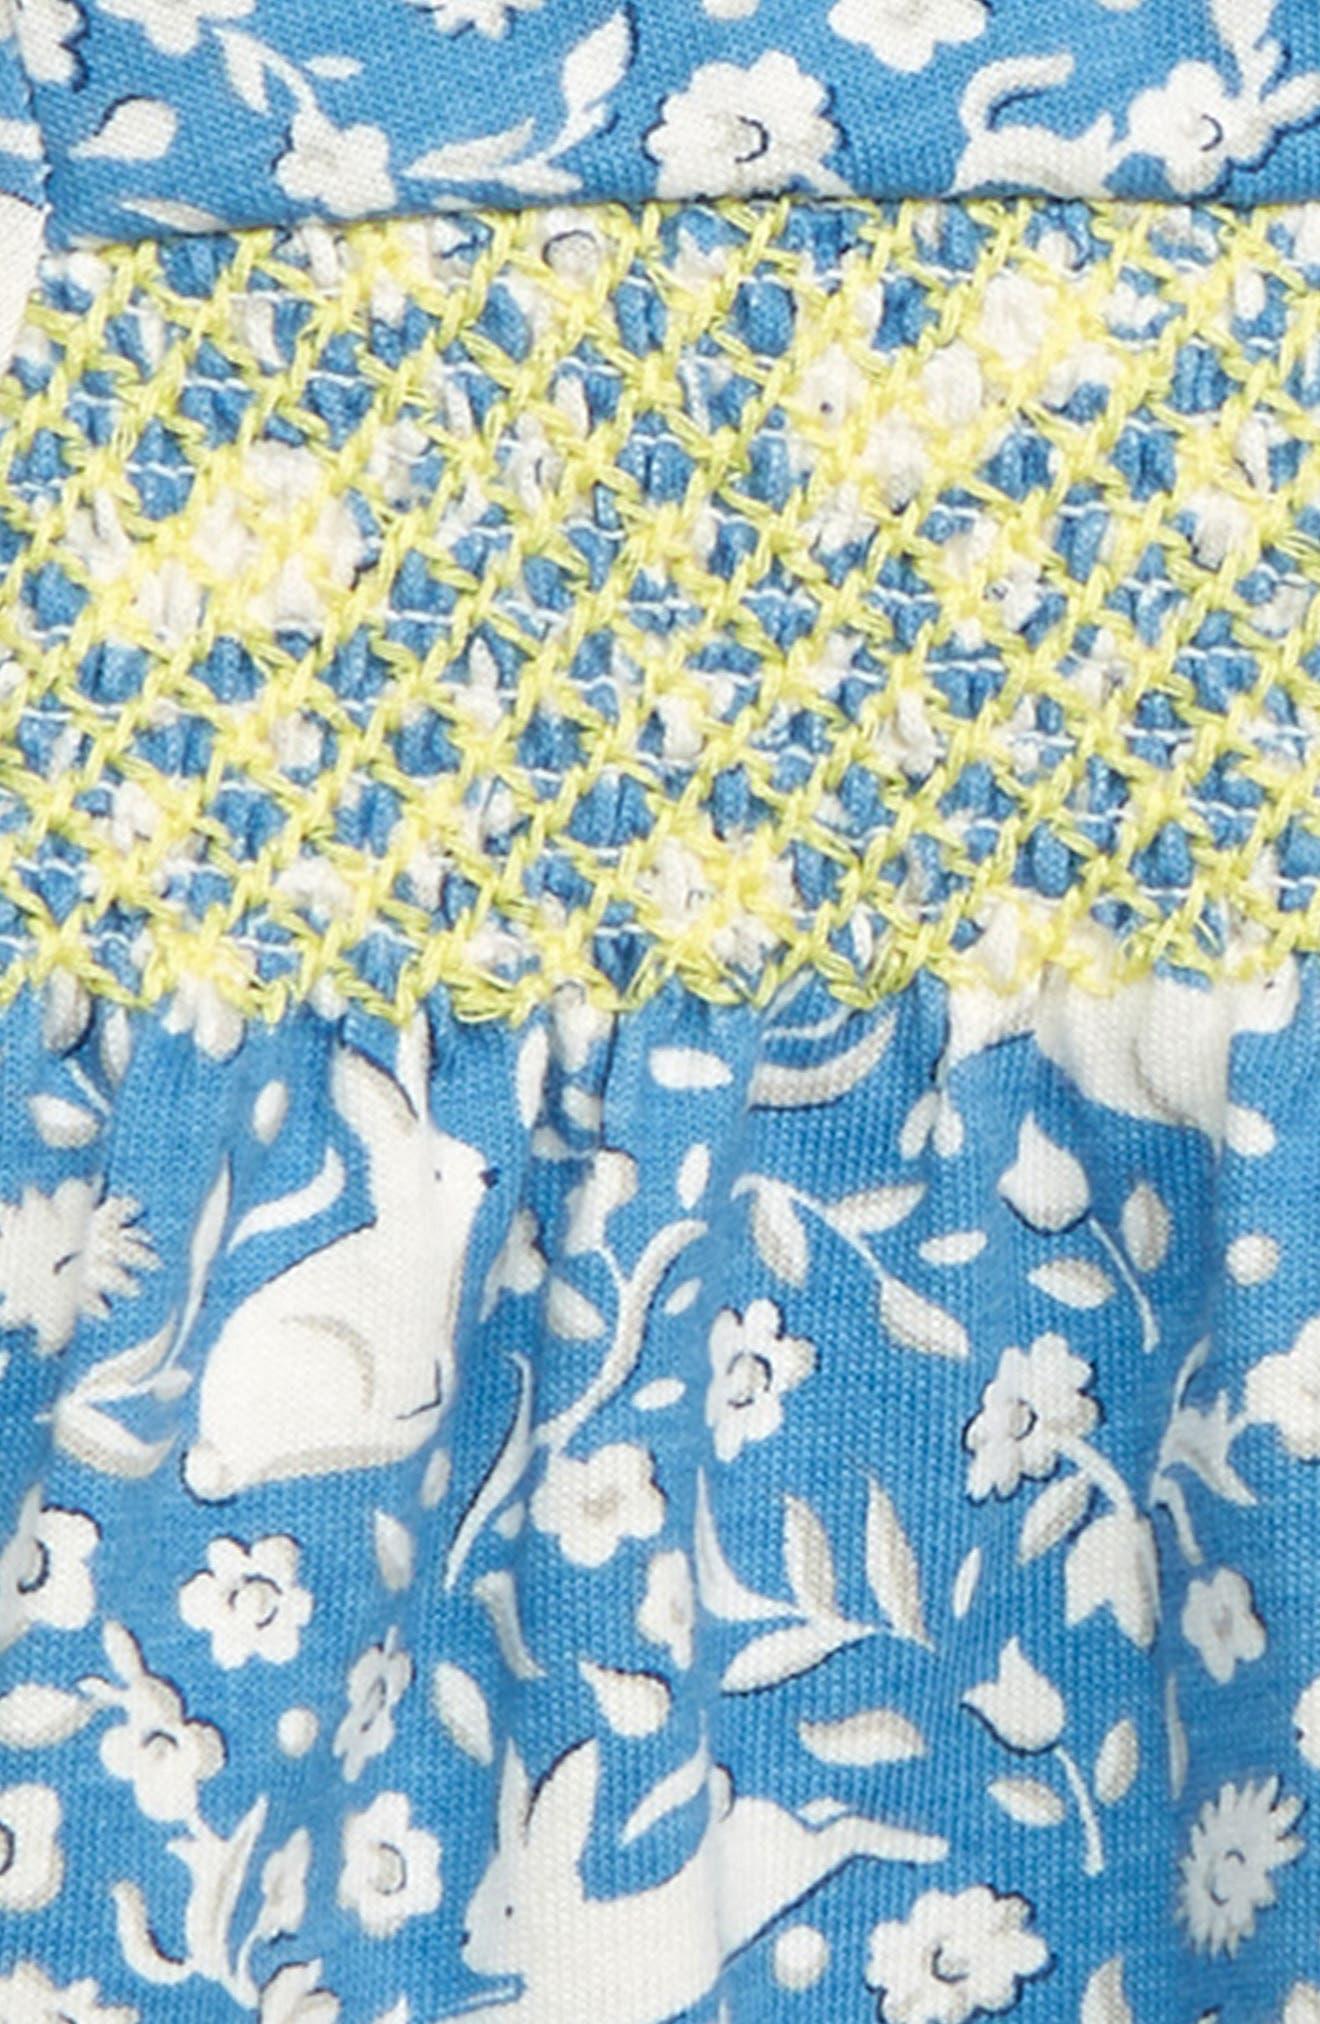 MINI BODEN, Pretty Smocked Jersey Dress, Alternate thumbnail 3, color, ELIZABETH BLUE WILD BUNNIES